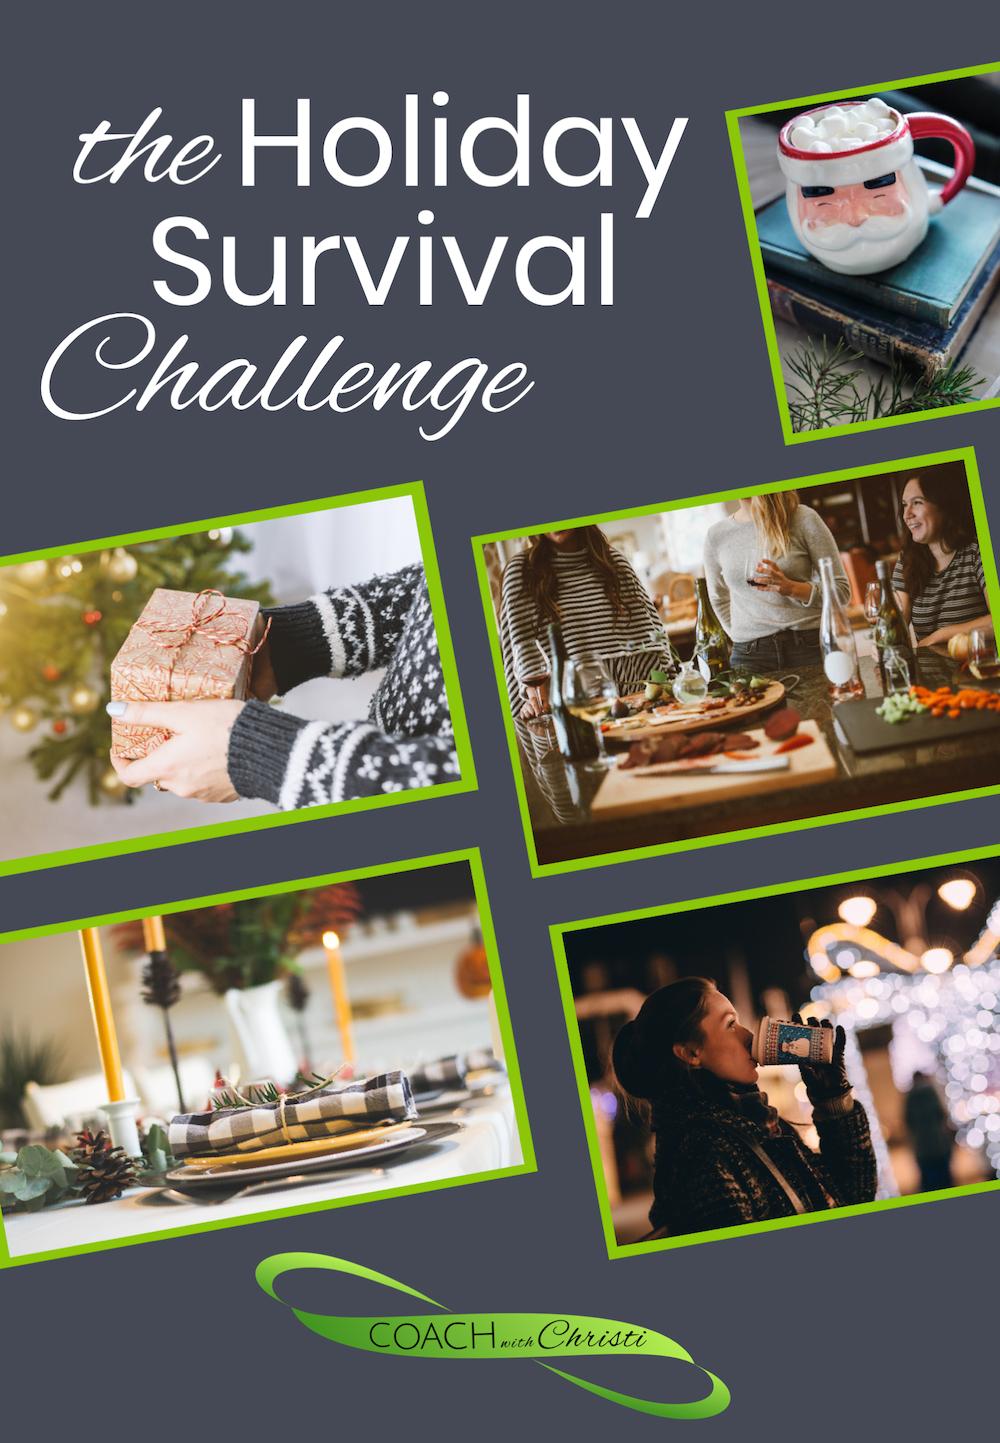 Challenge Vertical.png